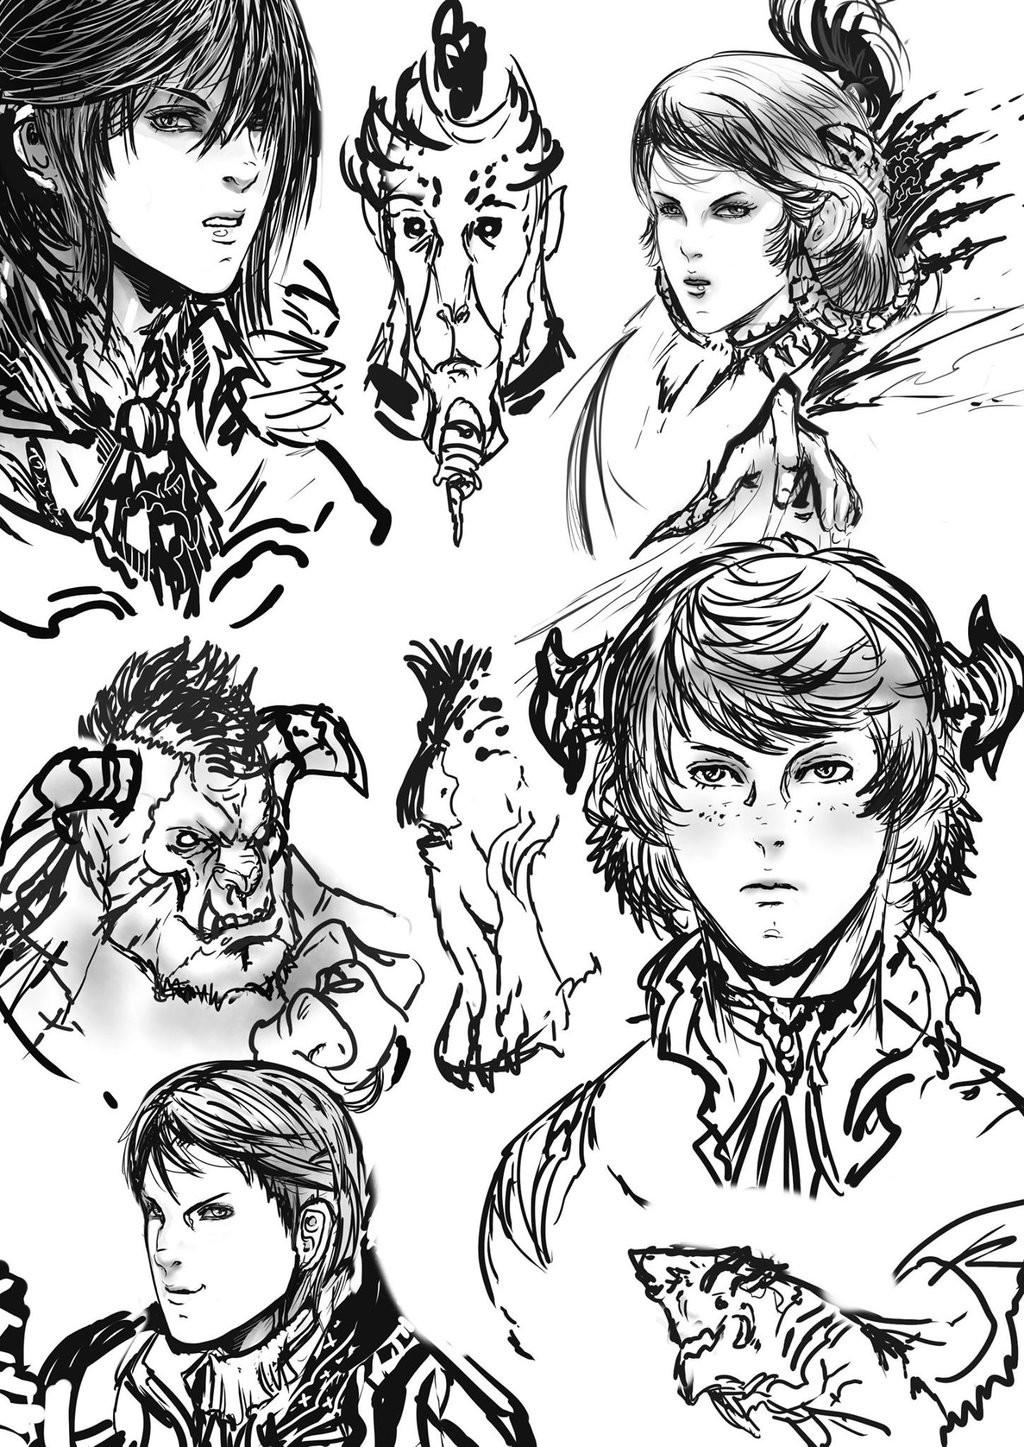 Julian tan character doodles by phantasmalblue da4xbj2